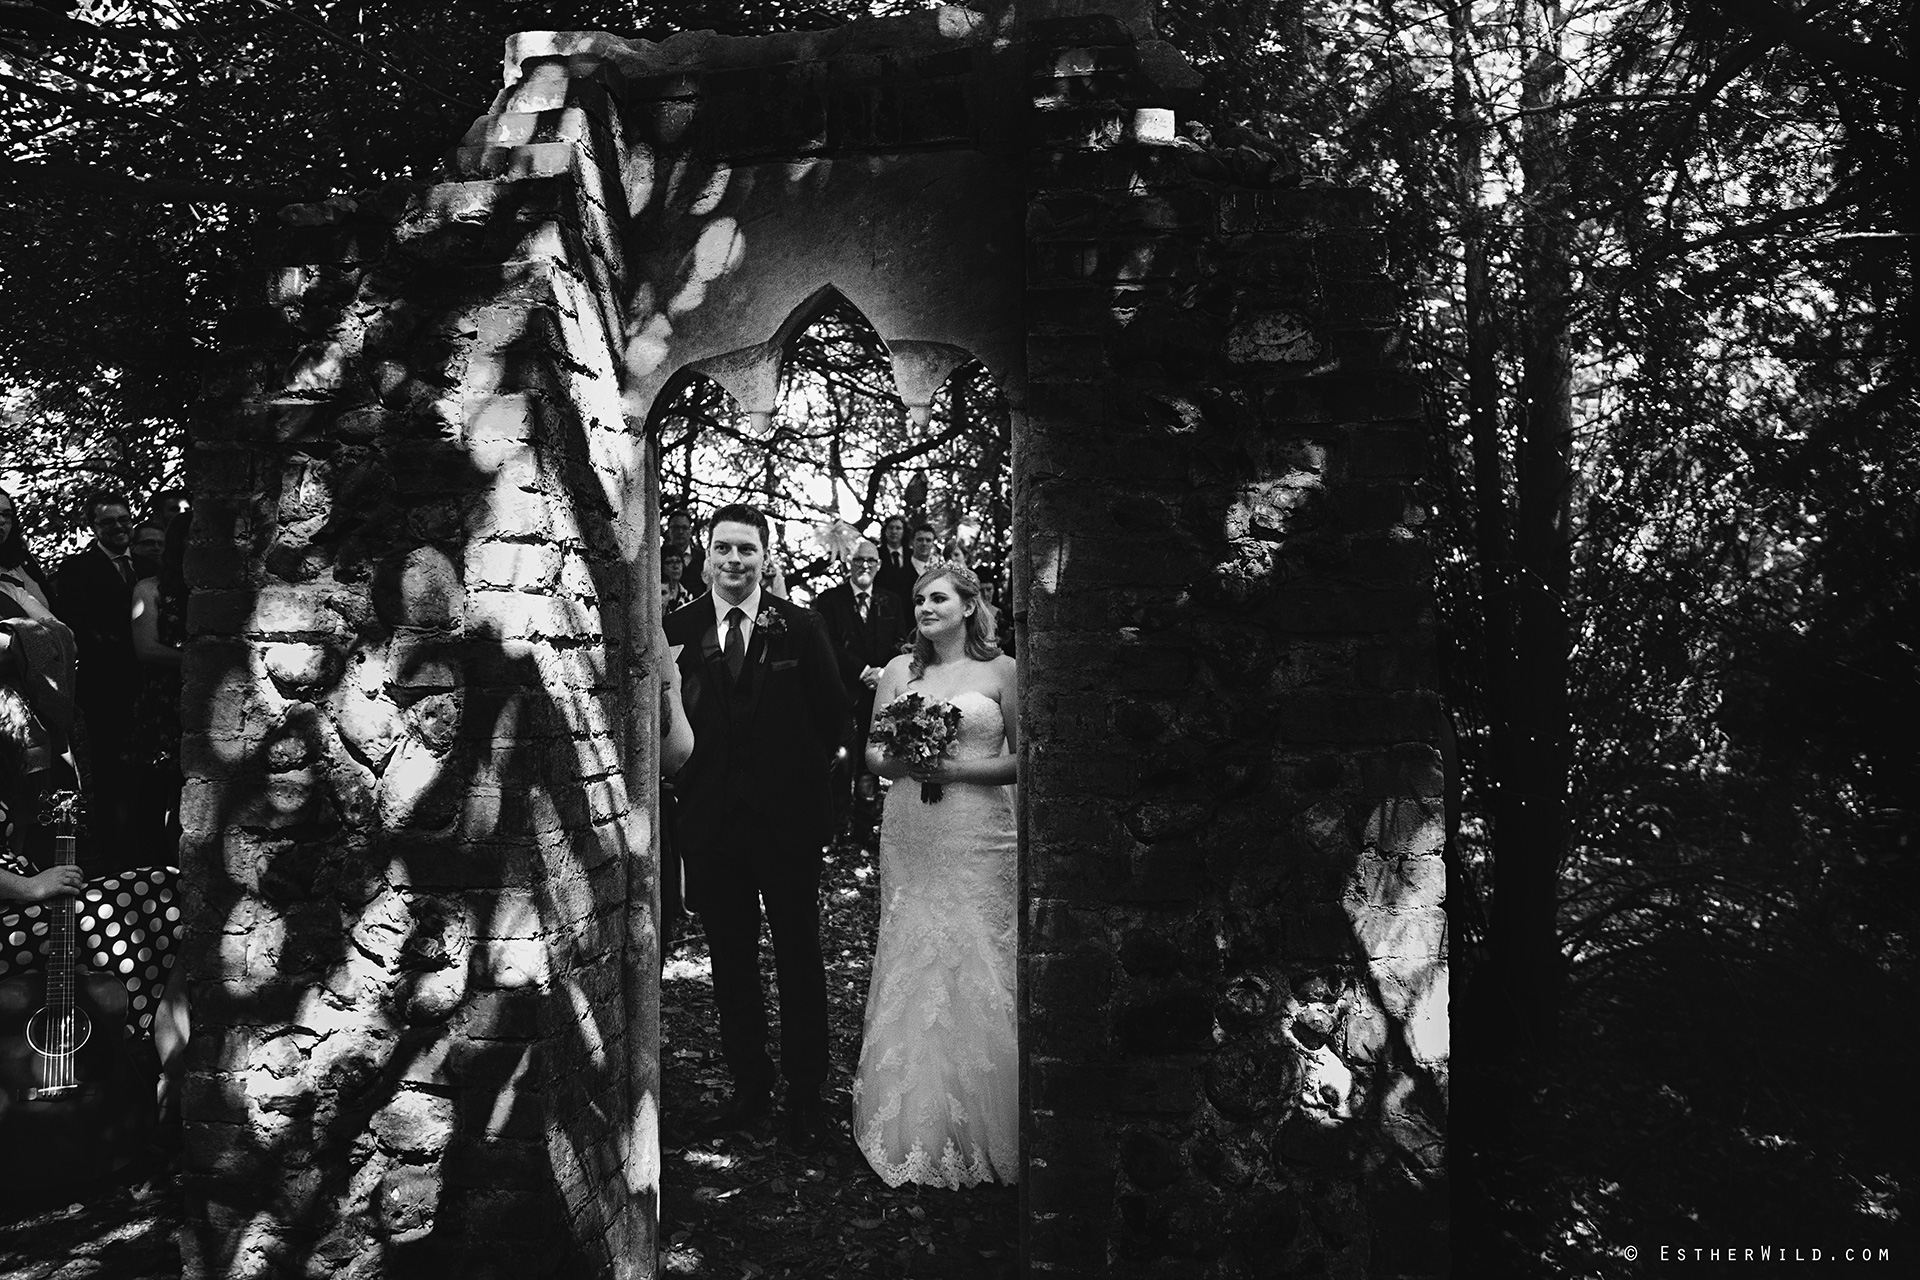 0617_Mannington_Hall_Gardens_Wedding_Photography_Esther_Wild_IMG_0985-1.jpg